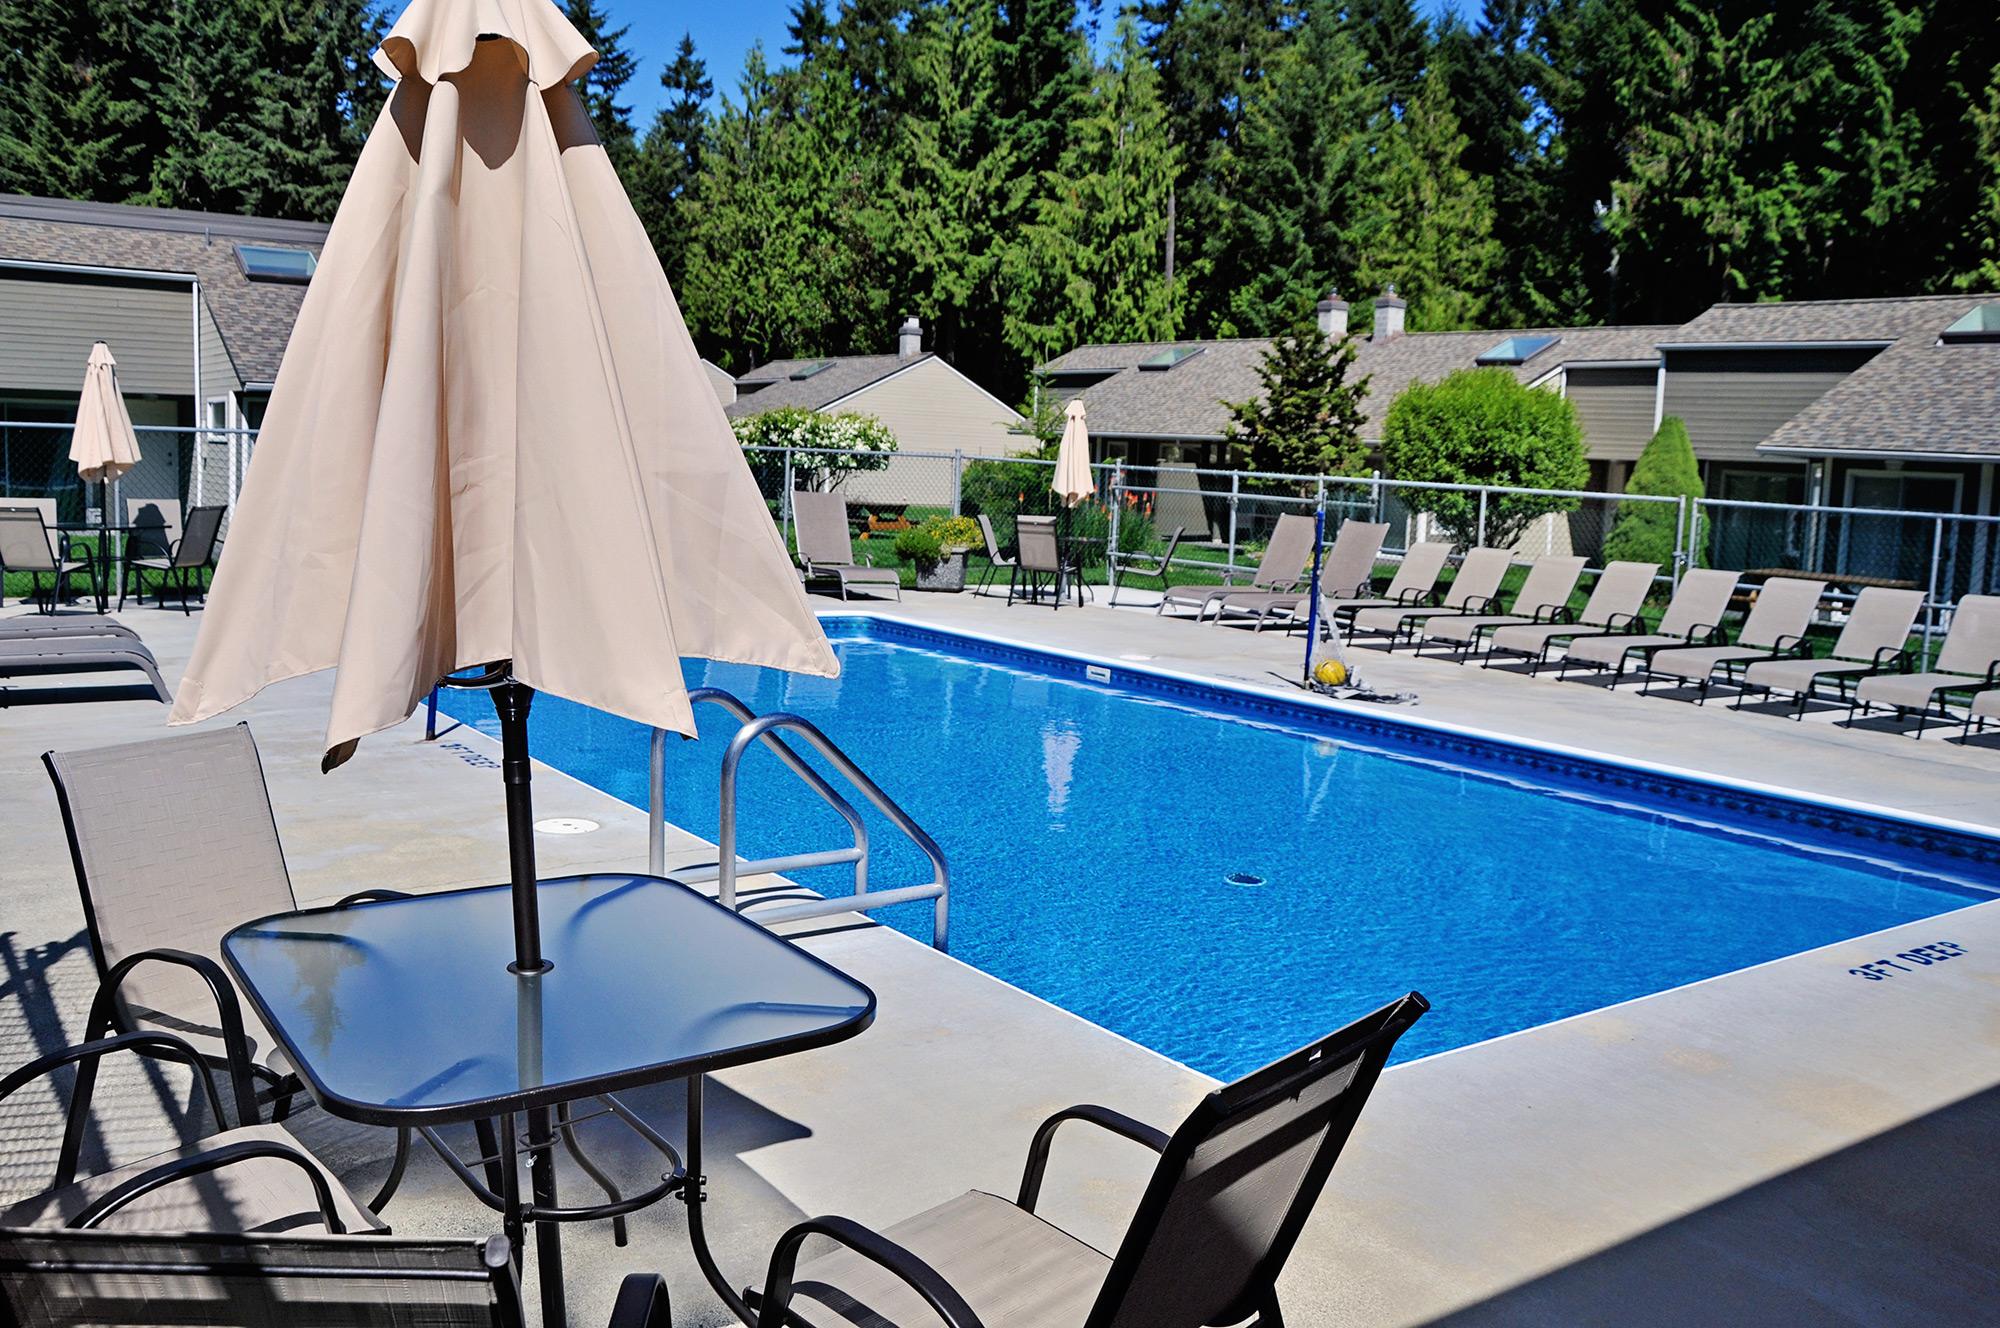 Ocean Trails Resort pool